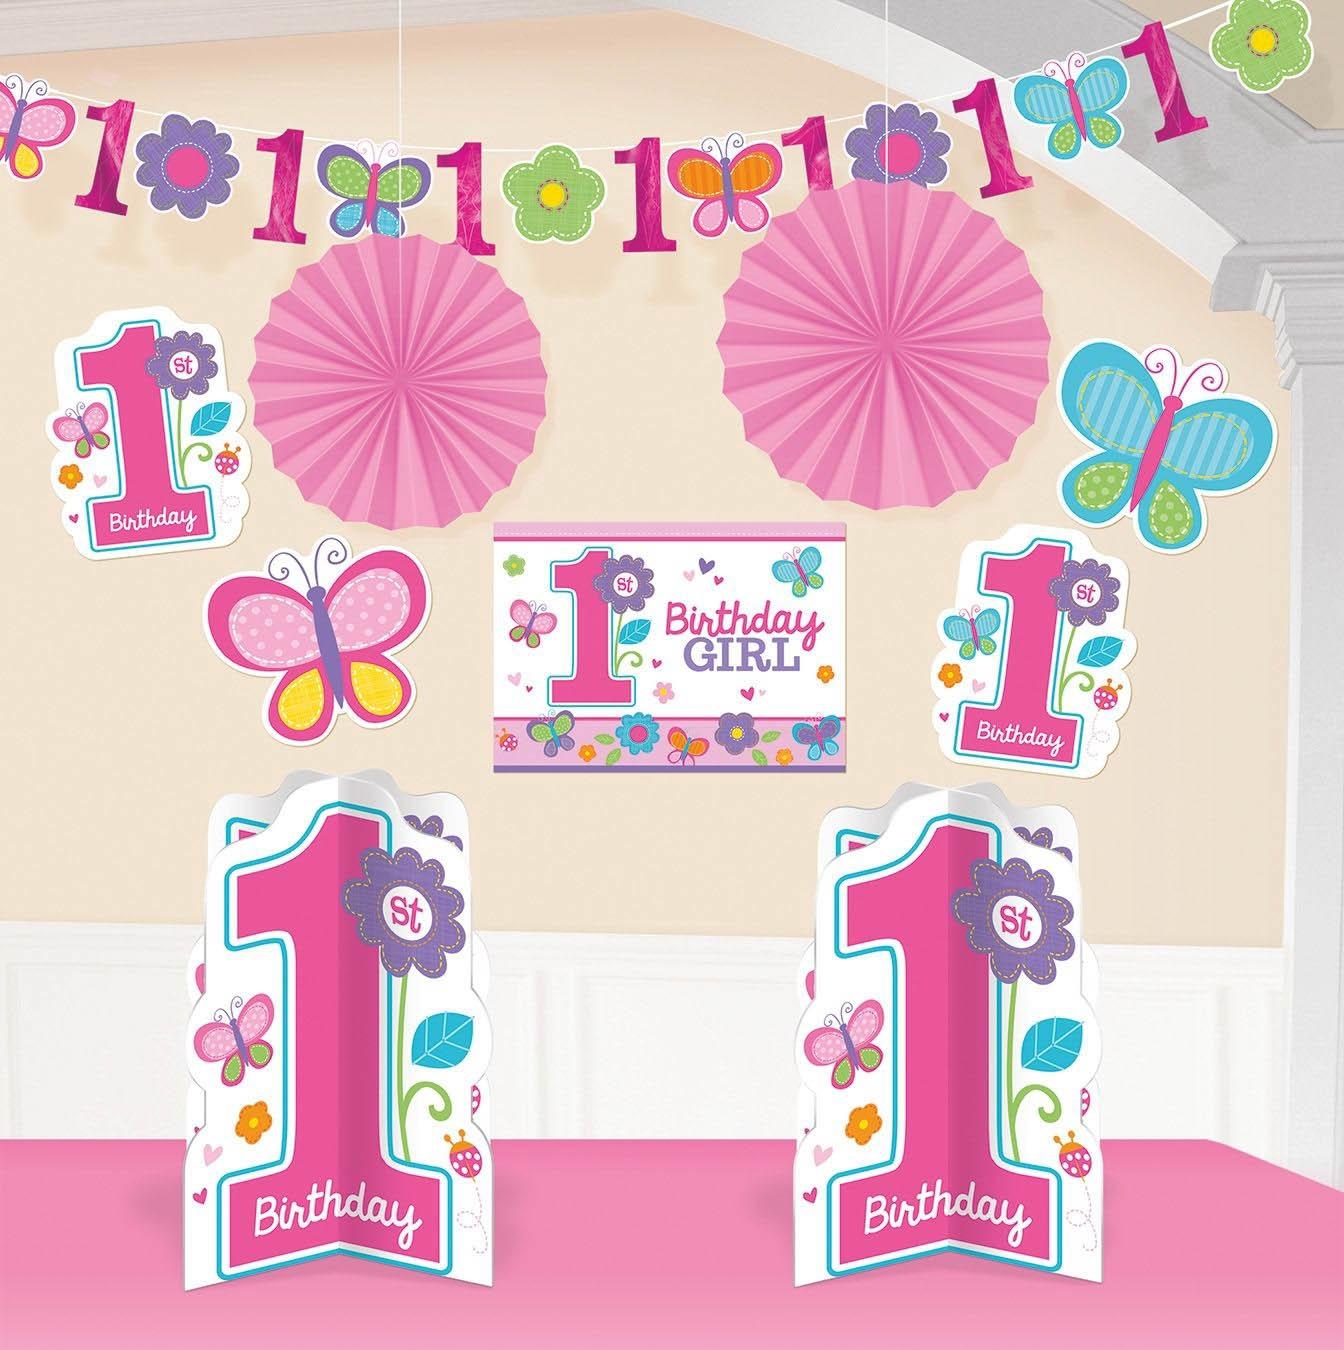 sweet birthday girl 1 geburtstag deko set 10 tlg f r m dchen 1 geburtstag baby party. Black Bedroom Furniture Sets. Home Design Ideas